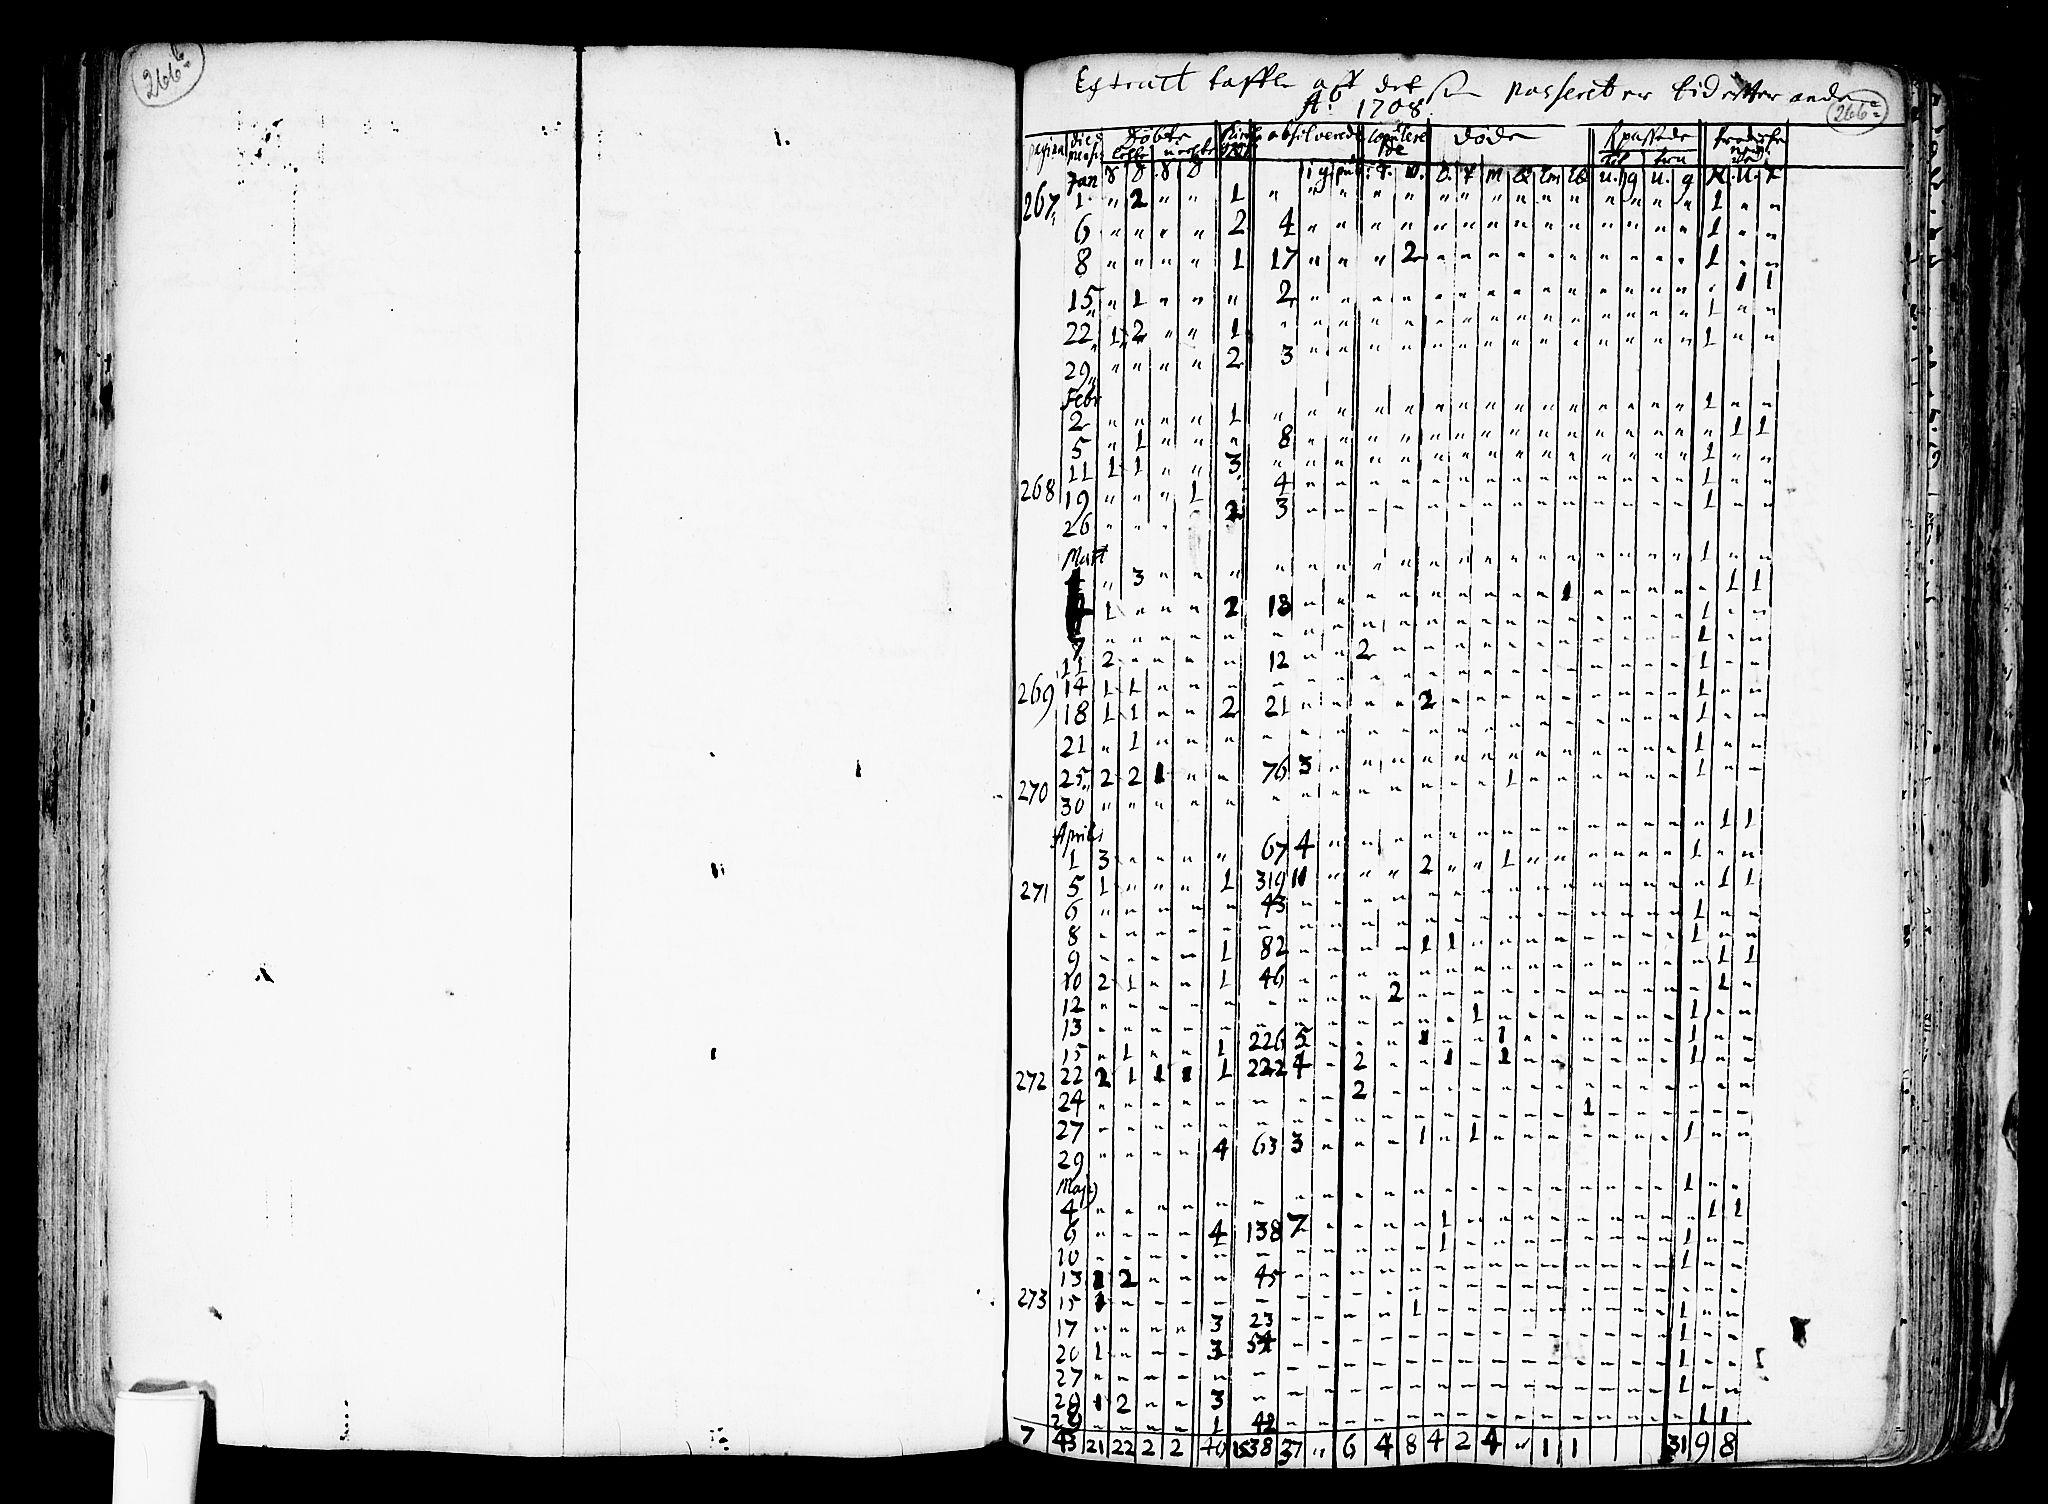 SAO, Nes prestekontor Kirkebøker, F/Fa/L0001: Parish register (official) no. I 1, 1689-1716, p. 266c